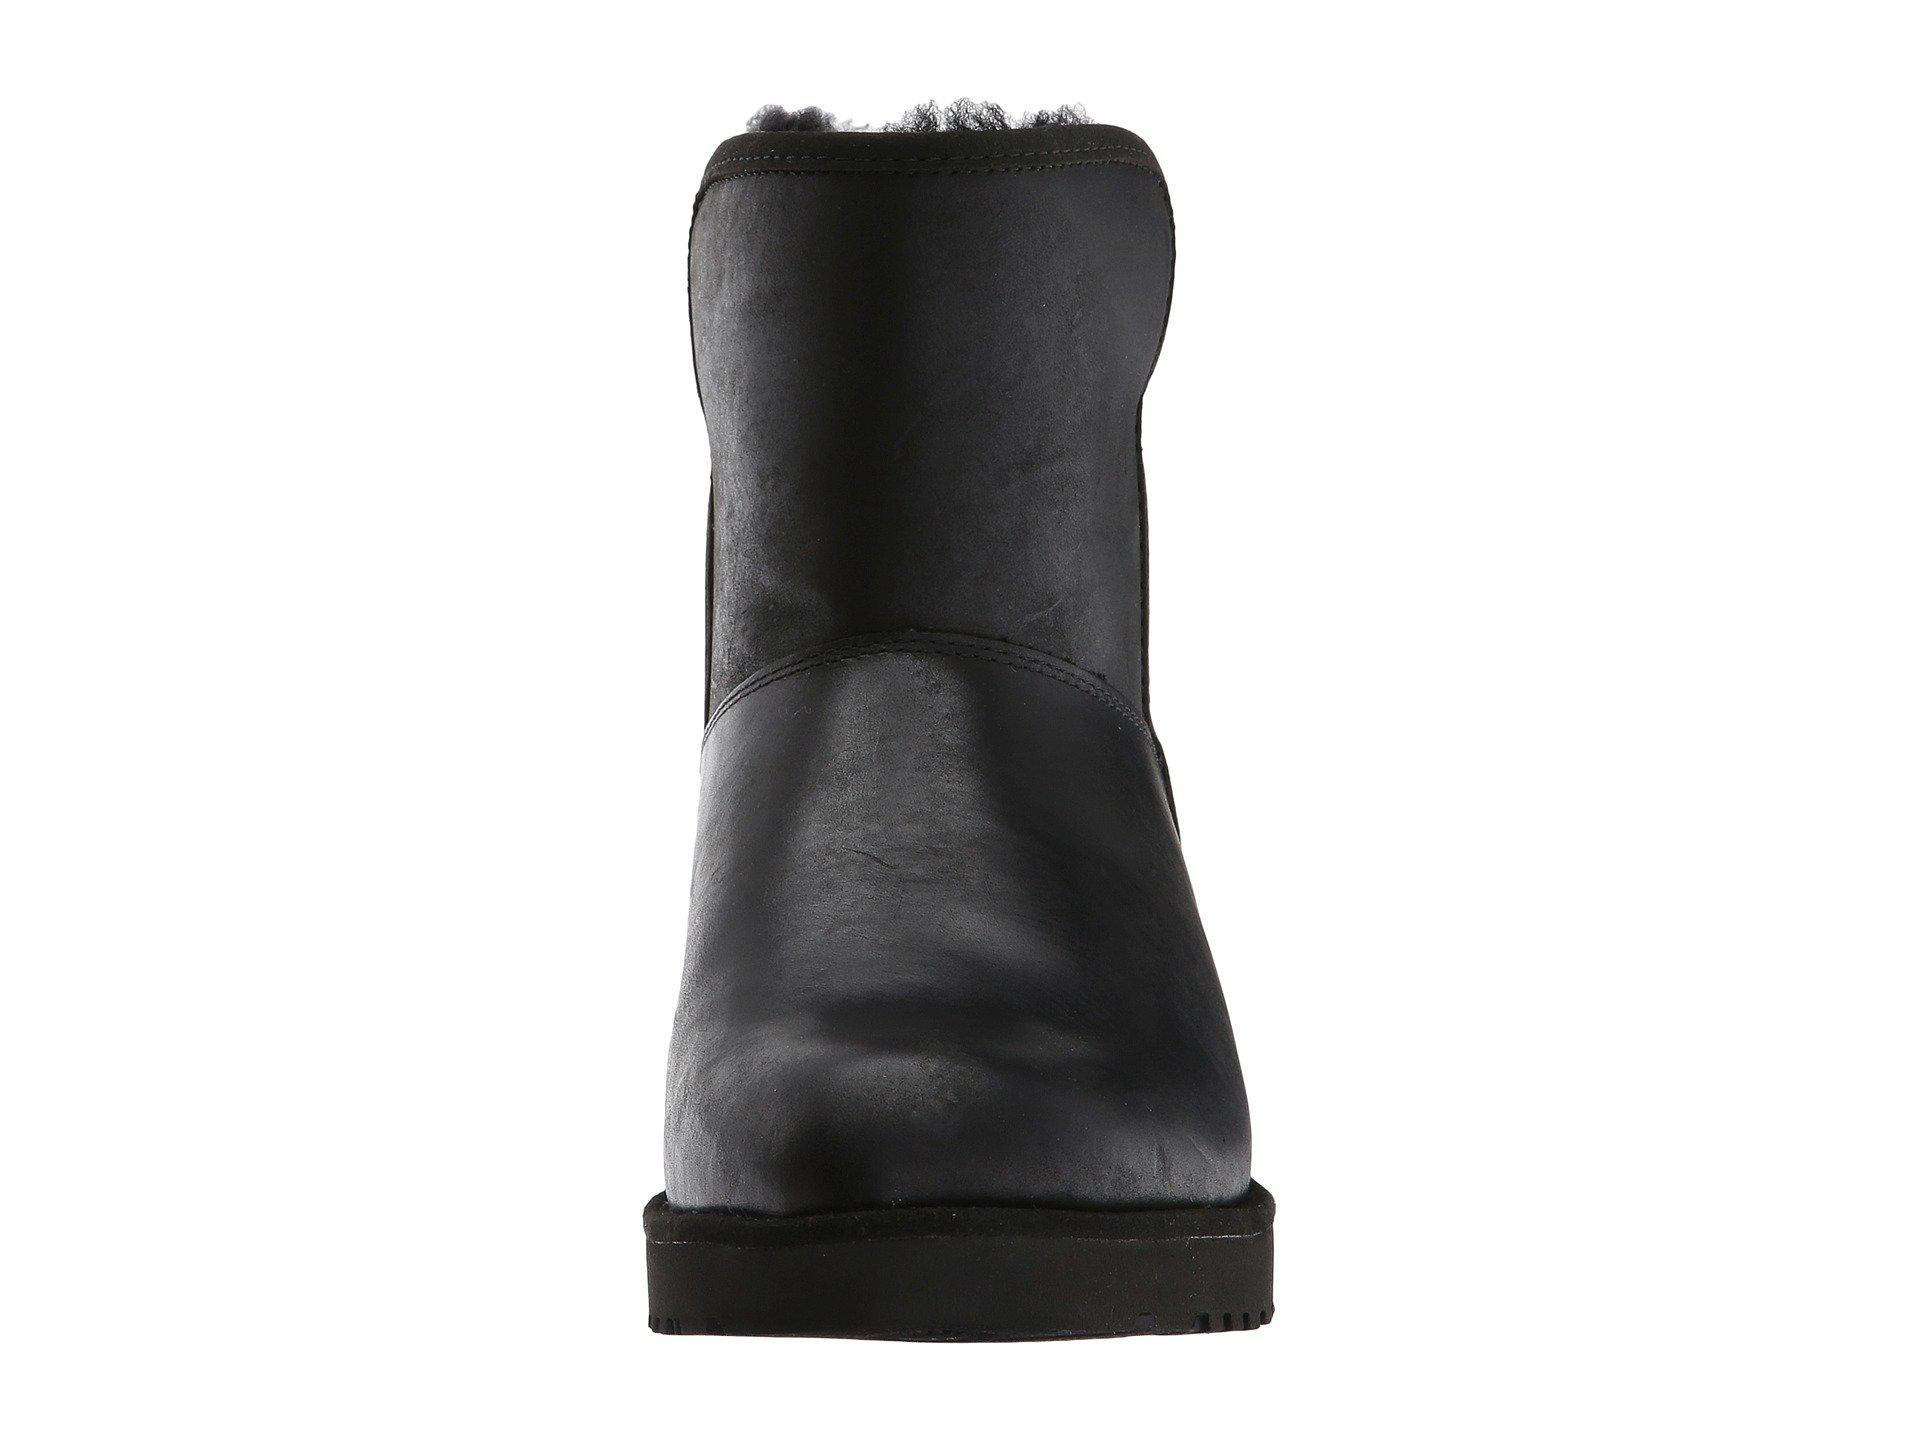 b4bbacf18d6 Ugg Black Kristin Leather